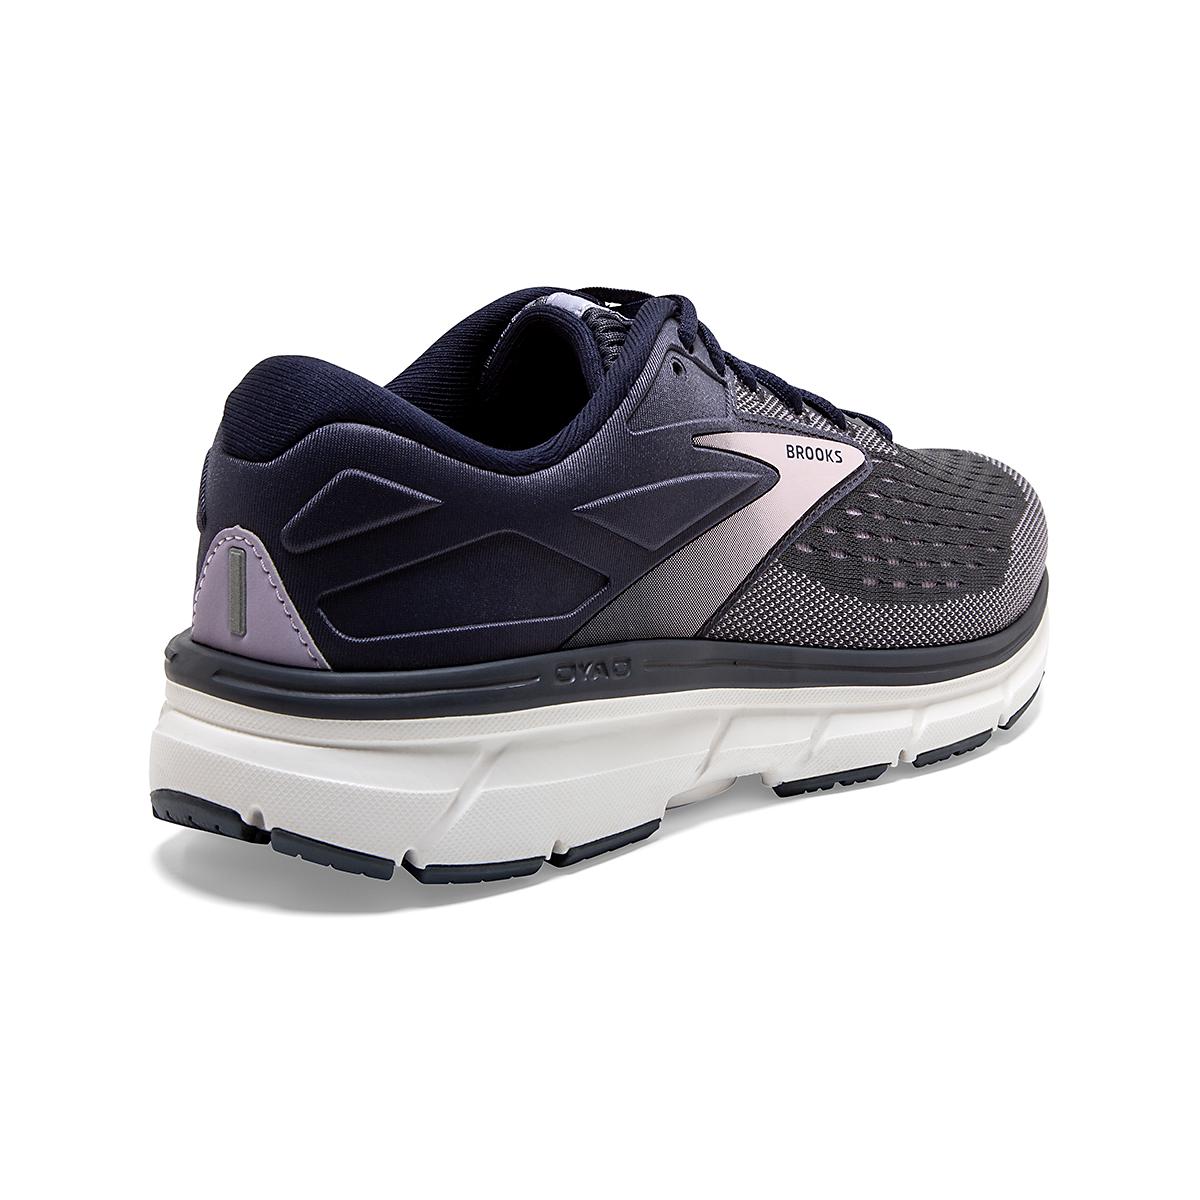 Women's Brooks Dyad 11 Running Shoe - Color: Ombre/Primrose  - Size: 6 - Width: Regular, Ombre/Primrose, large, image 4